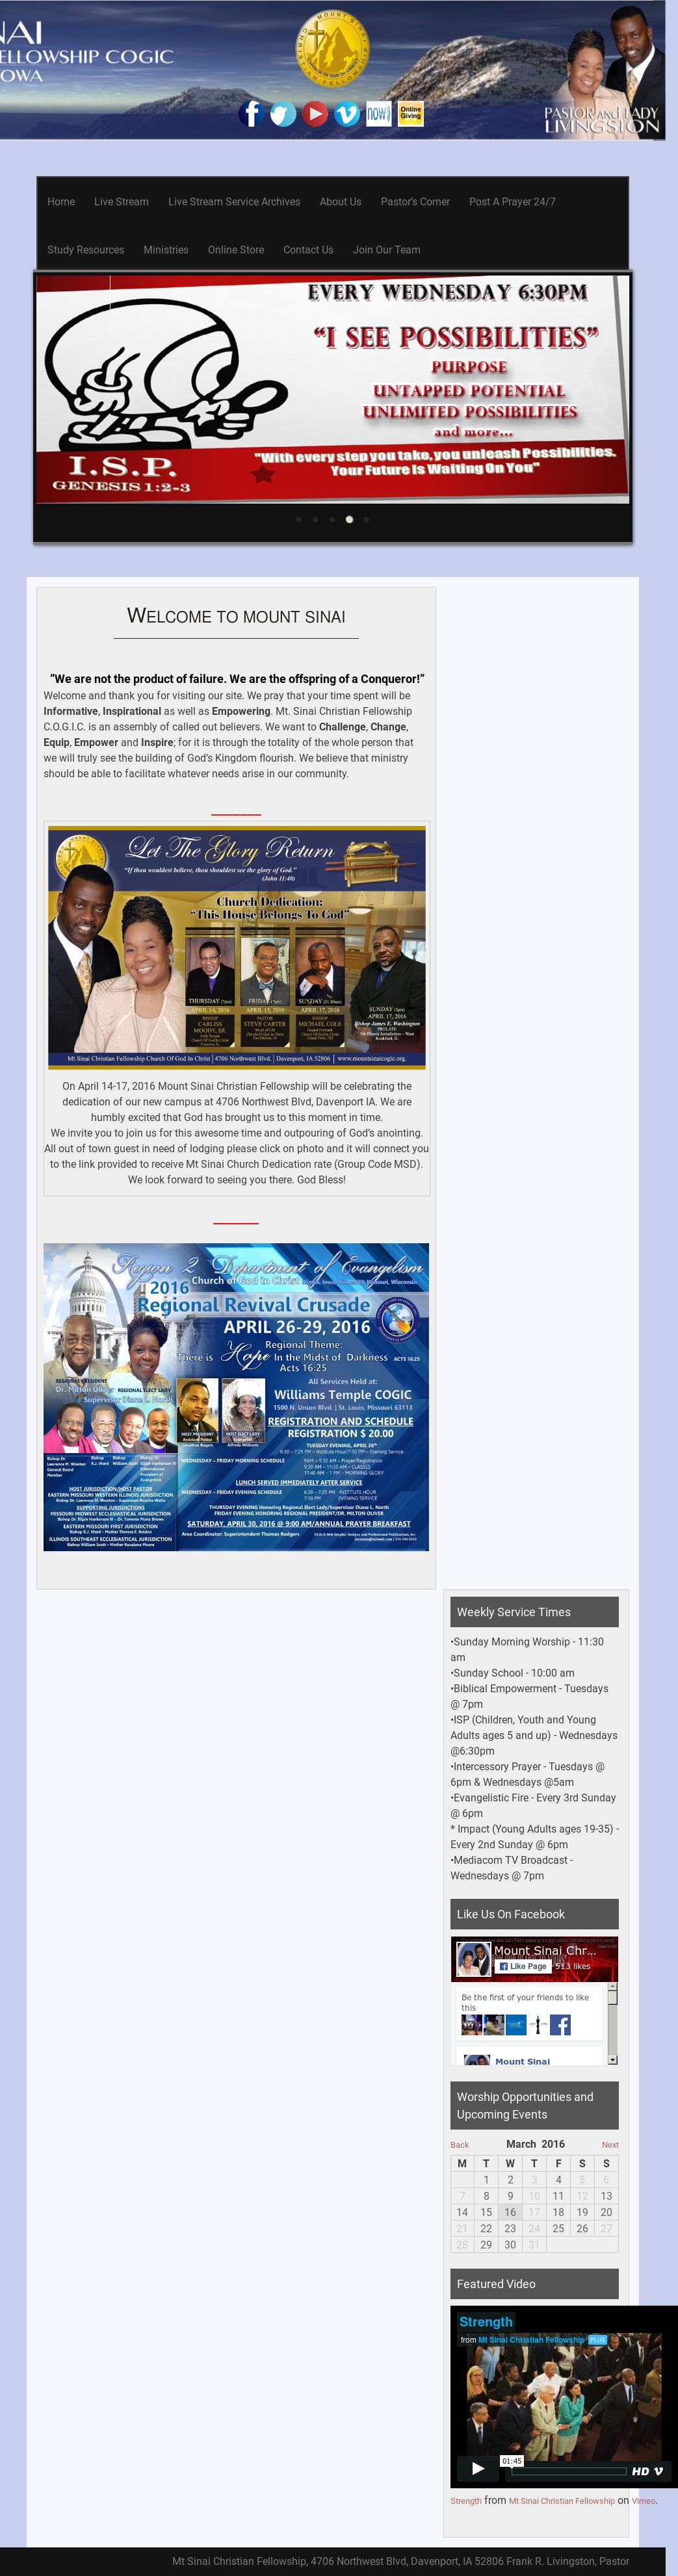 Mount Sinai Christian Fellowship Cogic Competitors, Revenue